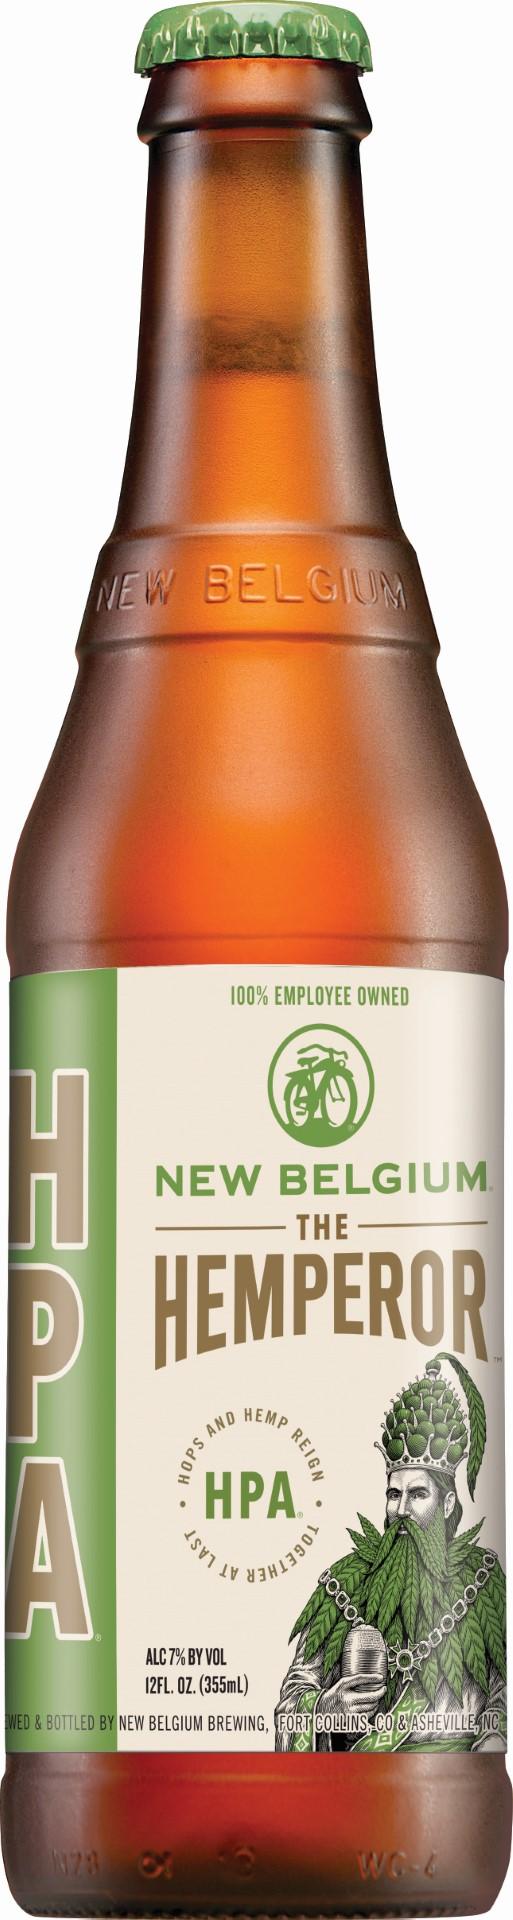 New Belgium The Hemperor HPA